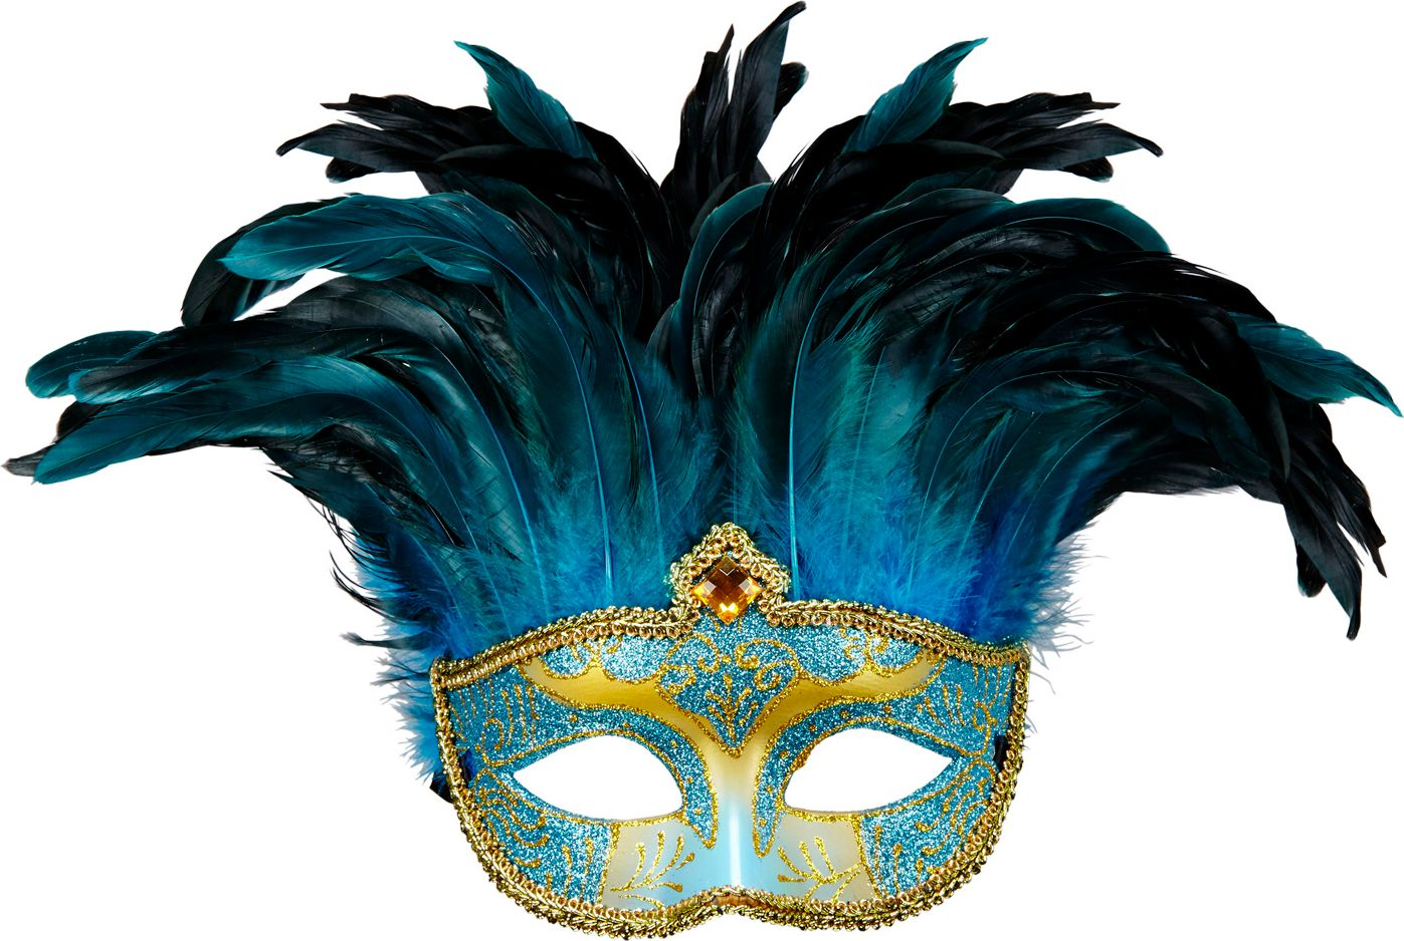 Blauwe venetiaanse gravin oogmasker met veren